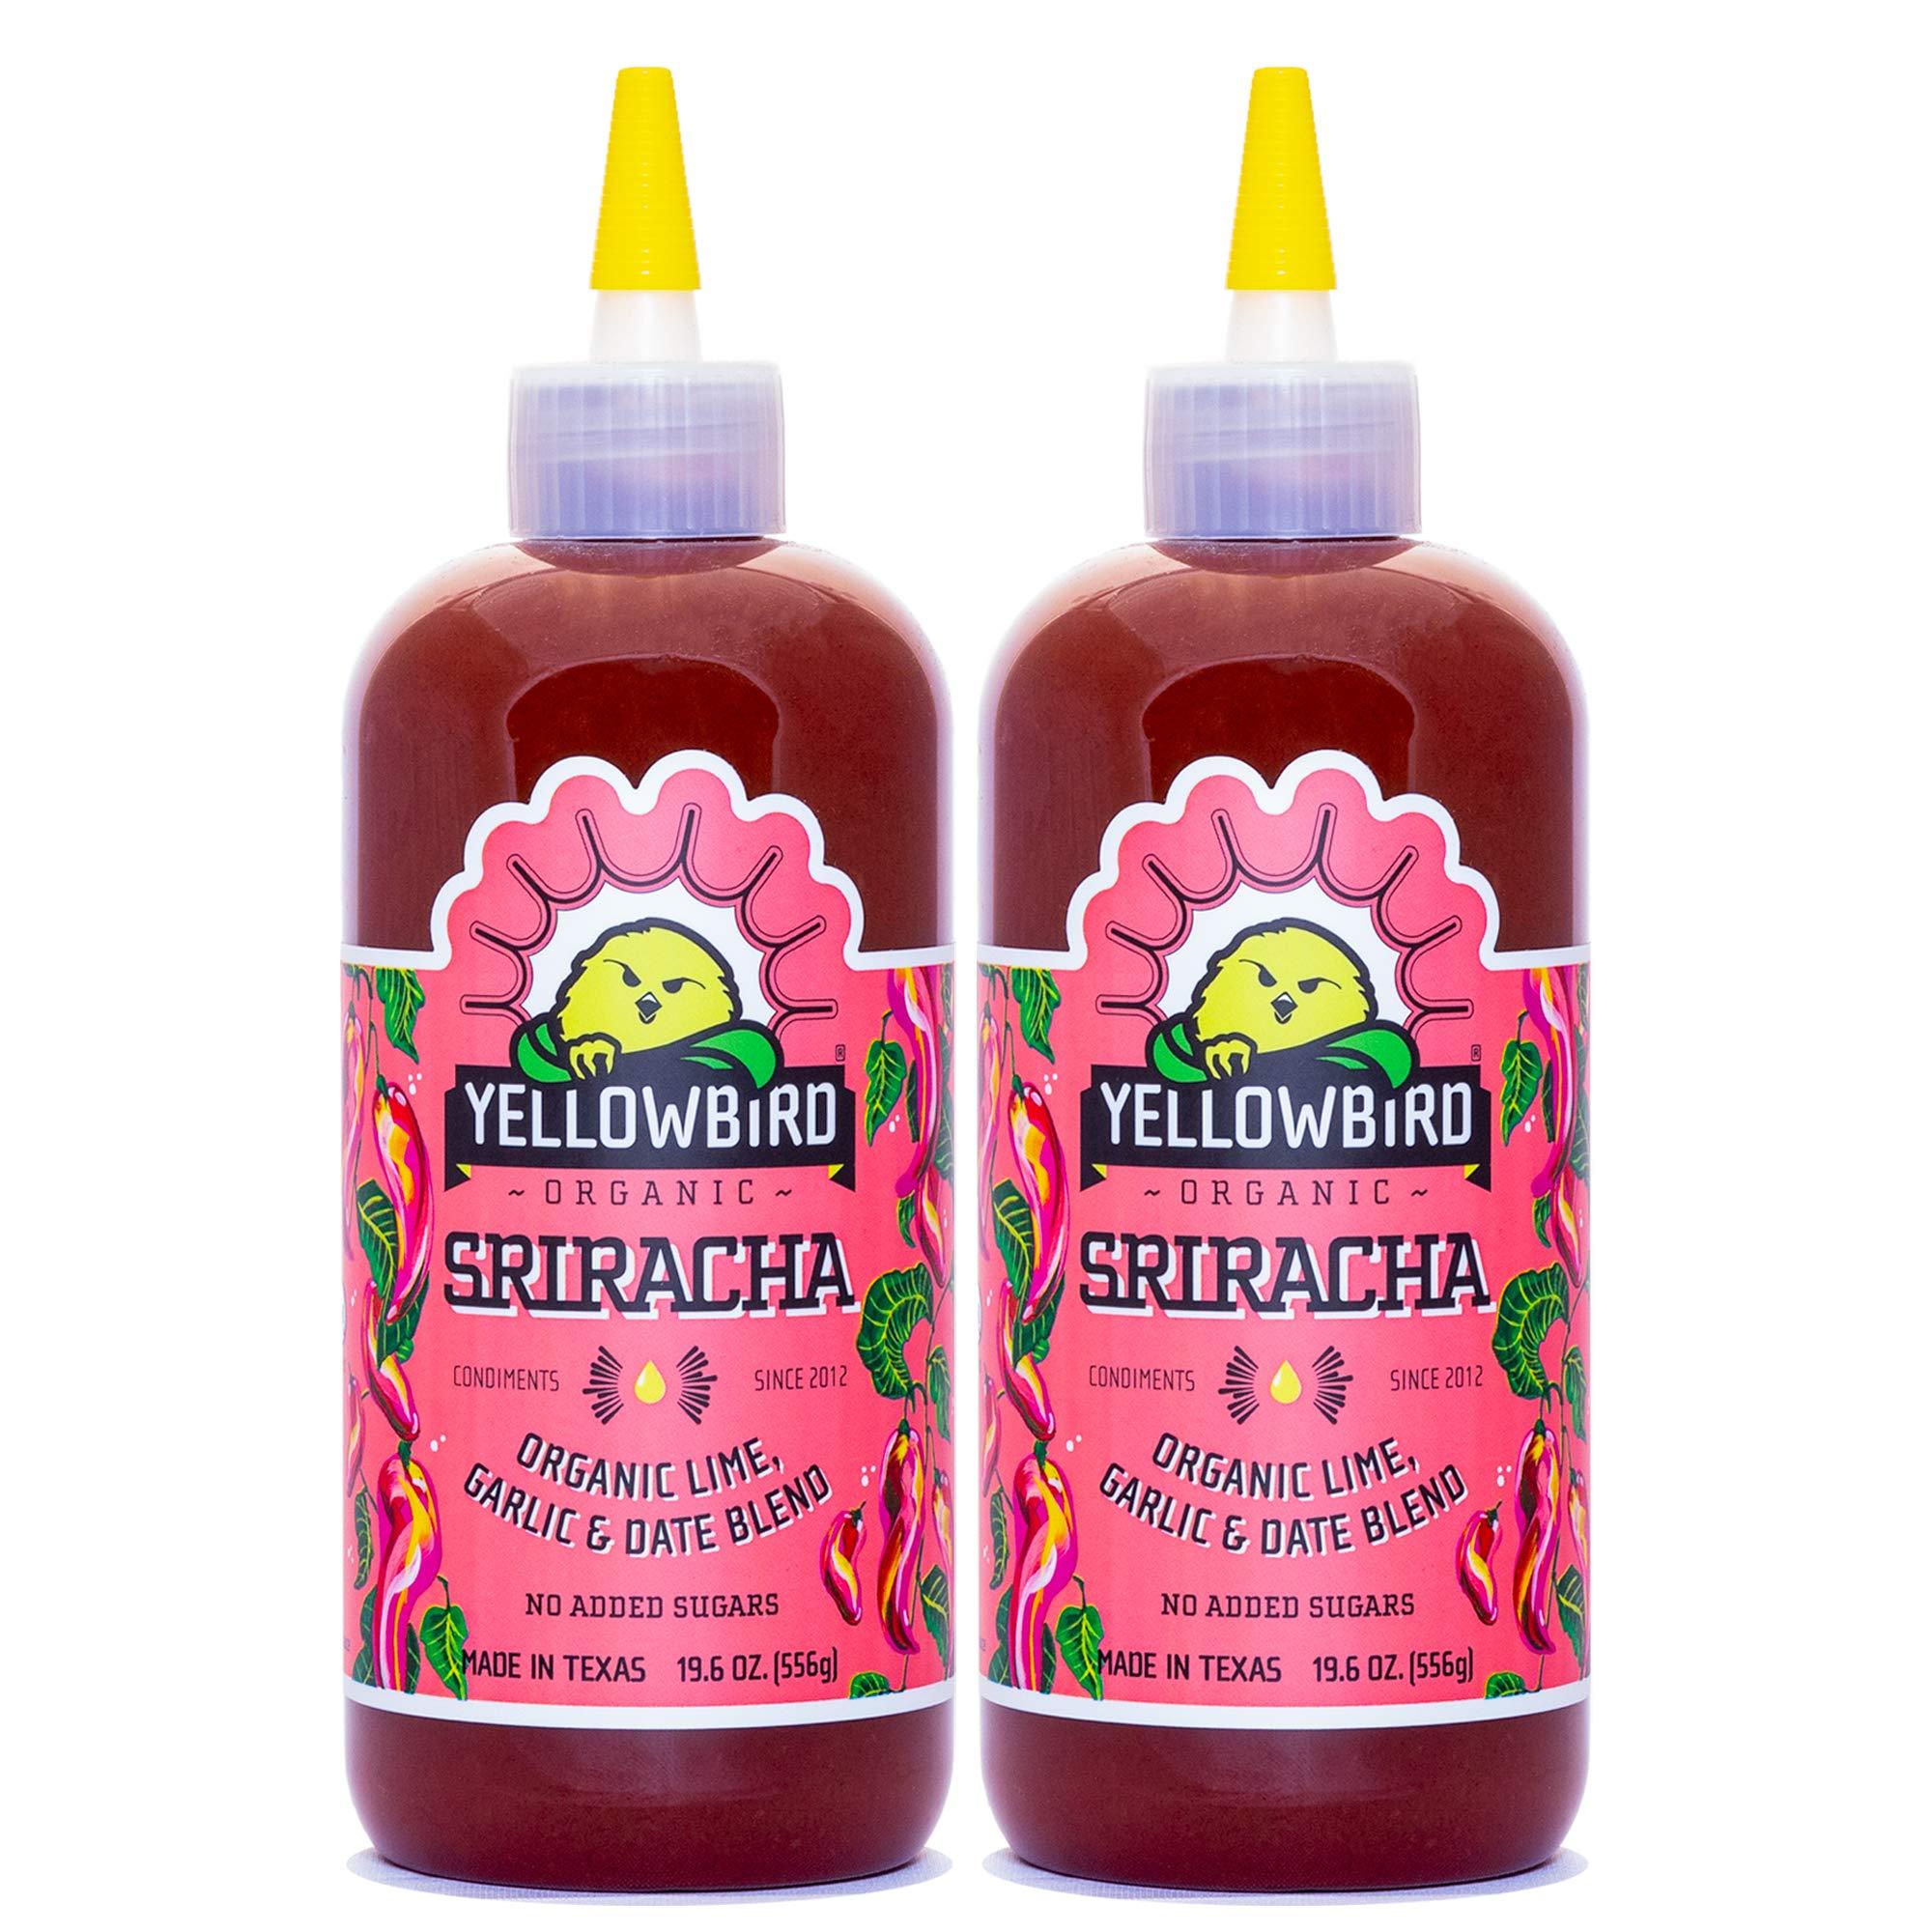 Organic Sriracha by Yellowbird Foods, All Natural, Non-GMO, 19.6 oz bottle, 2-Pack